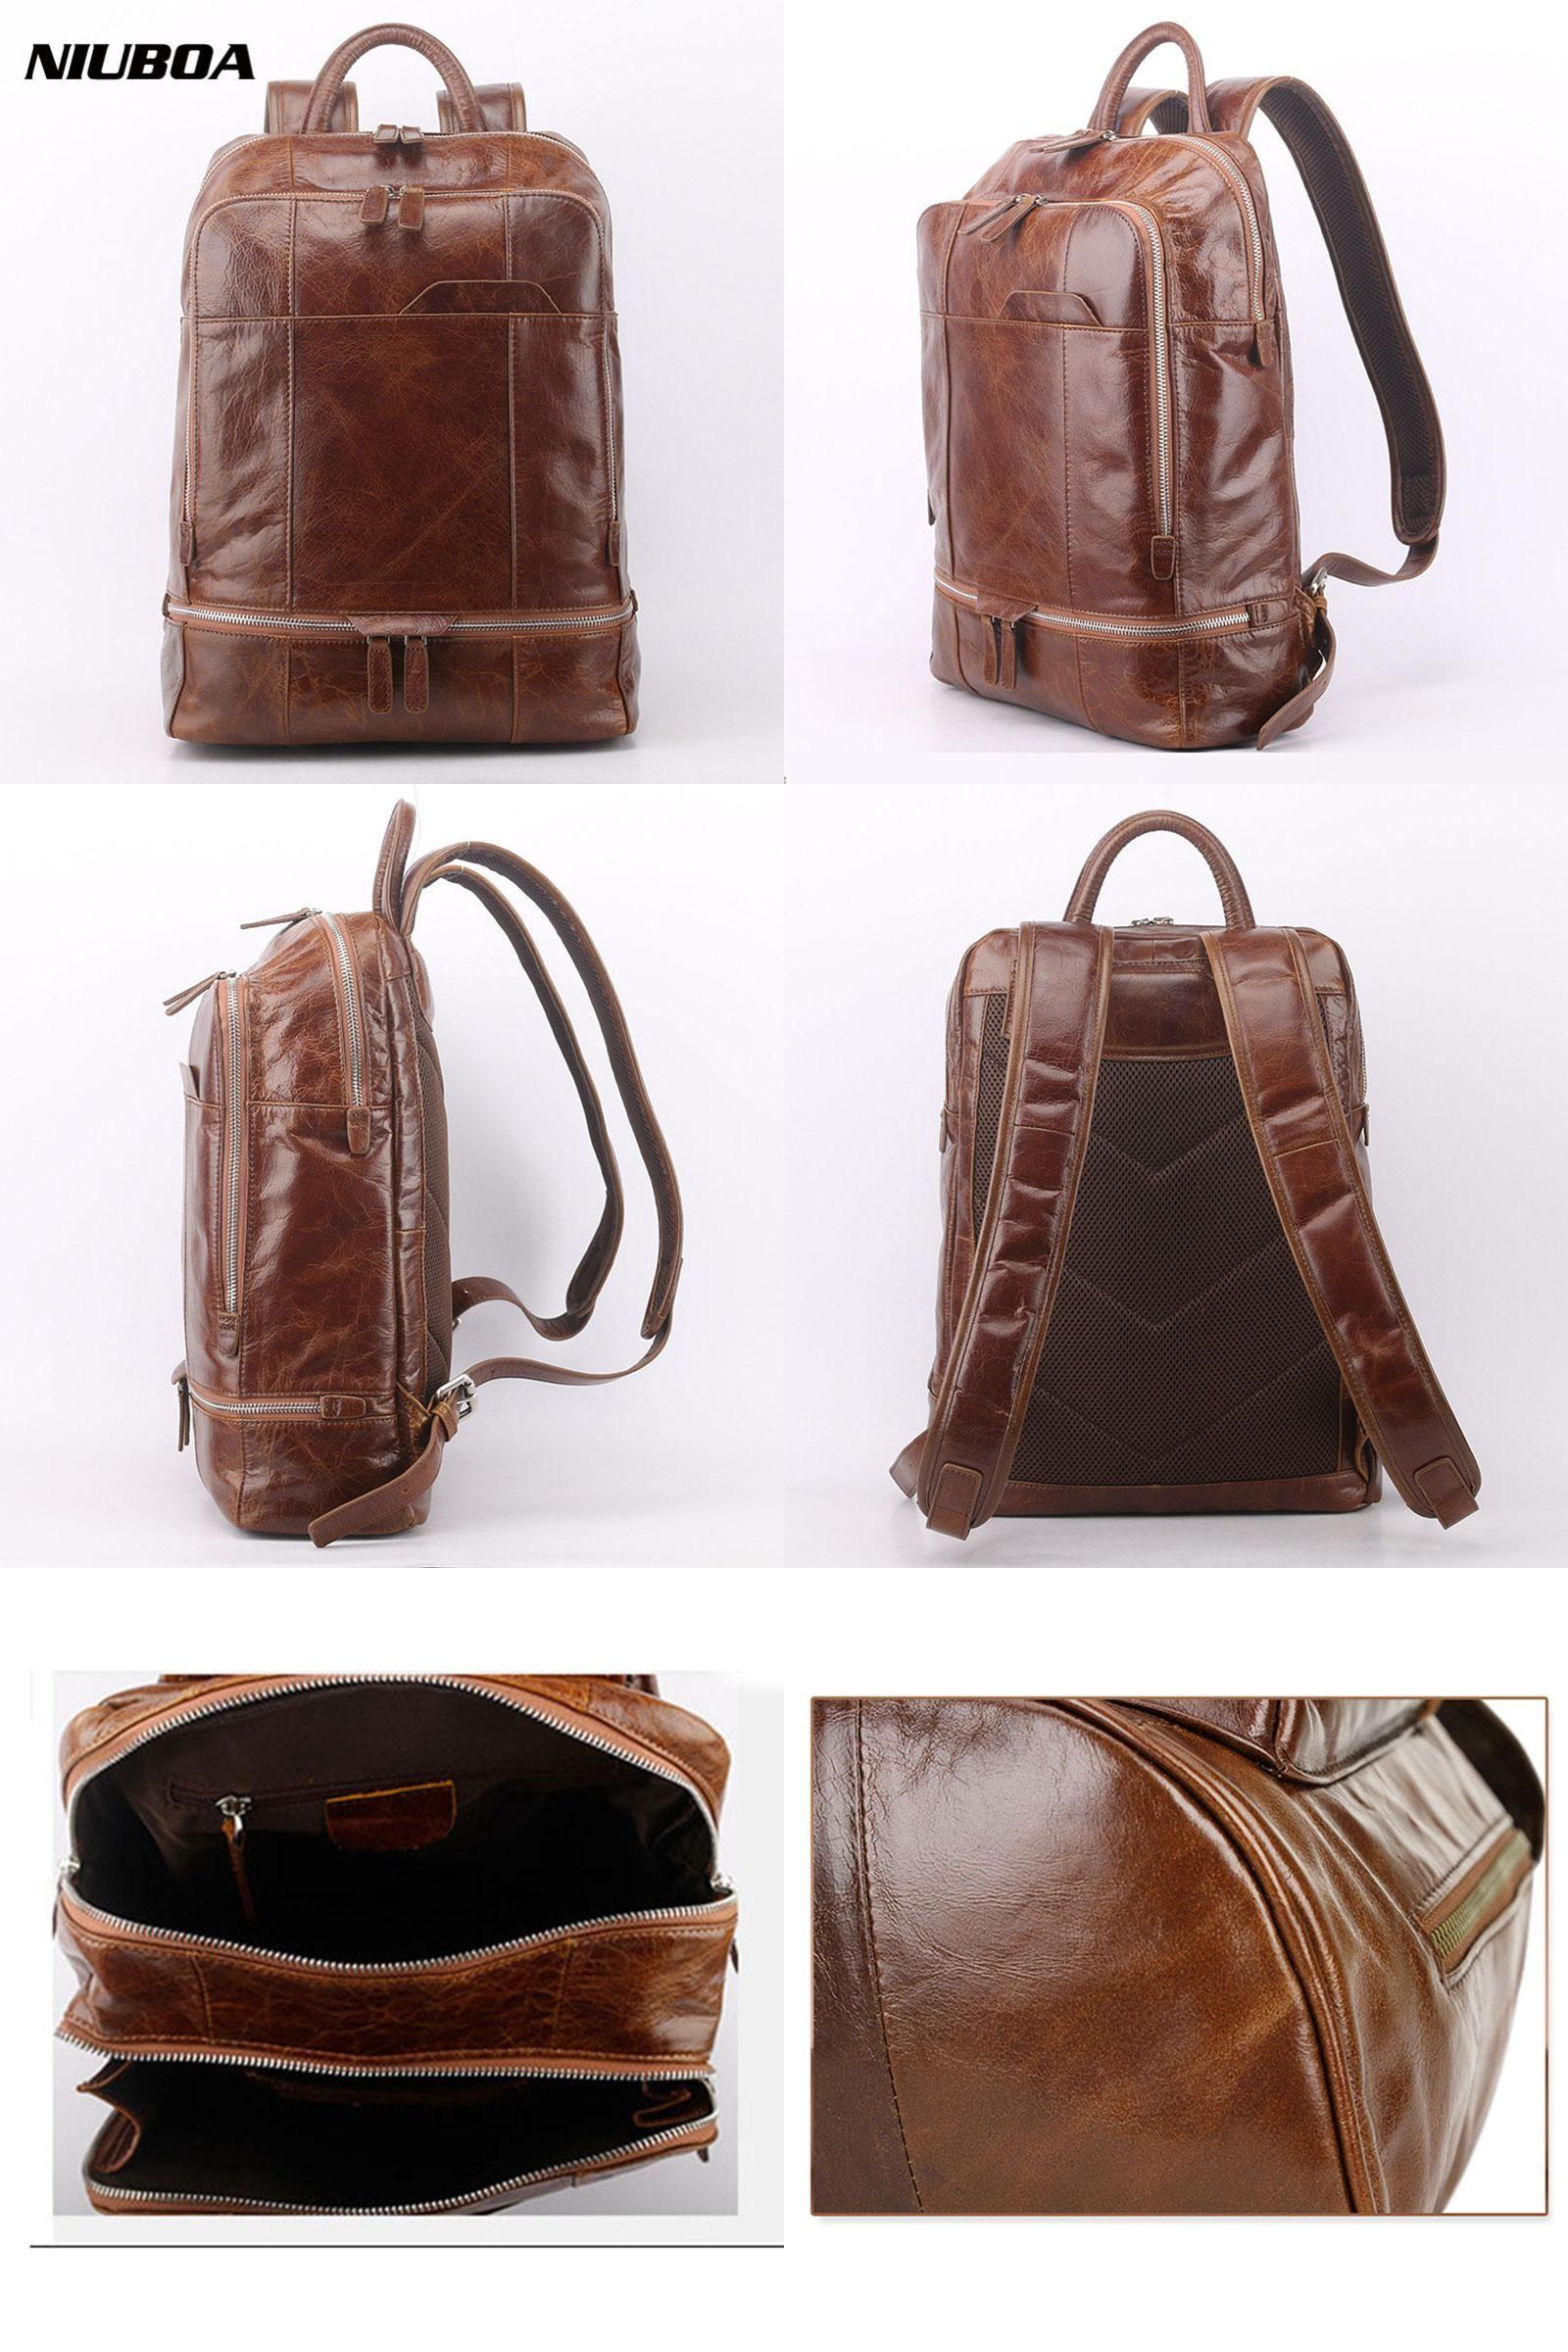 Visit to Buy] NIUBOA Genuine Leather Backpack Men High Quality ...